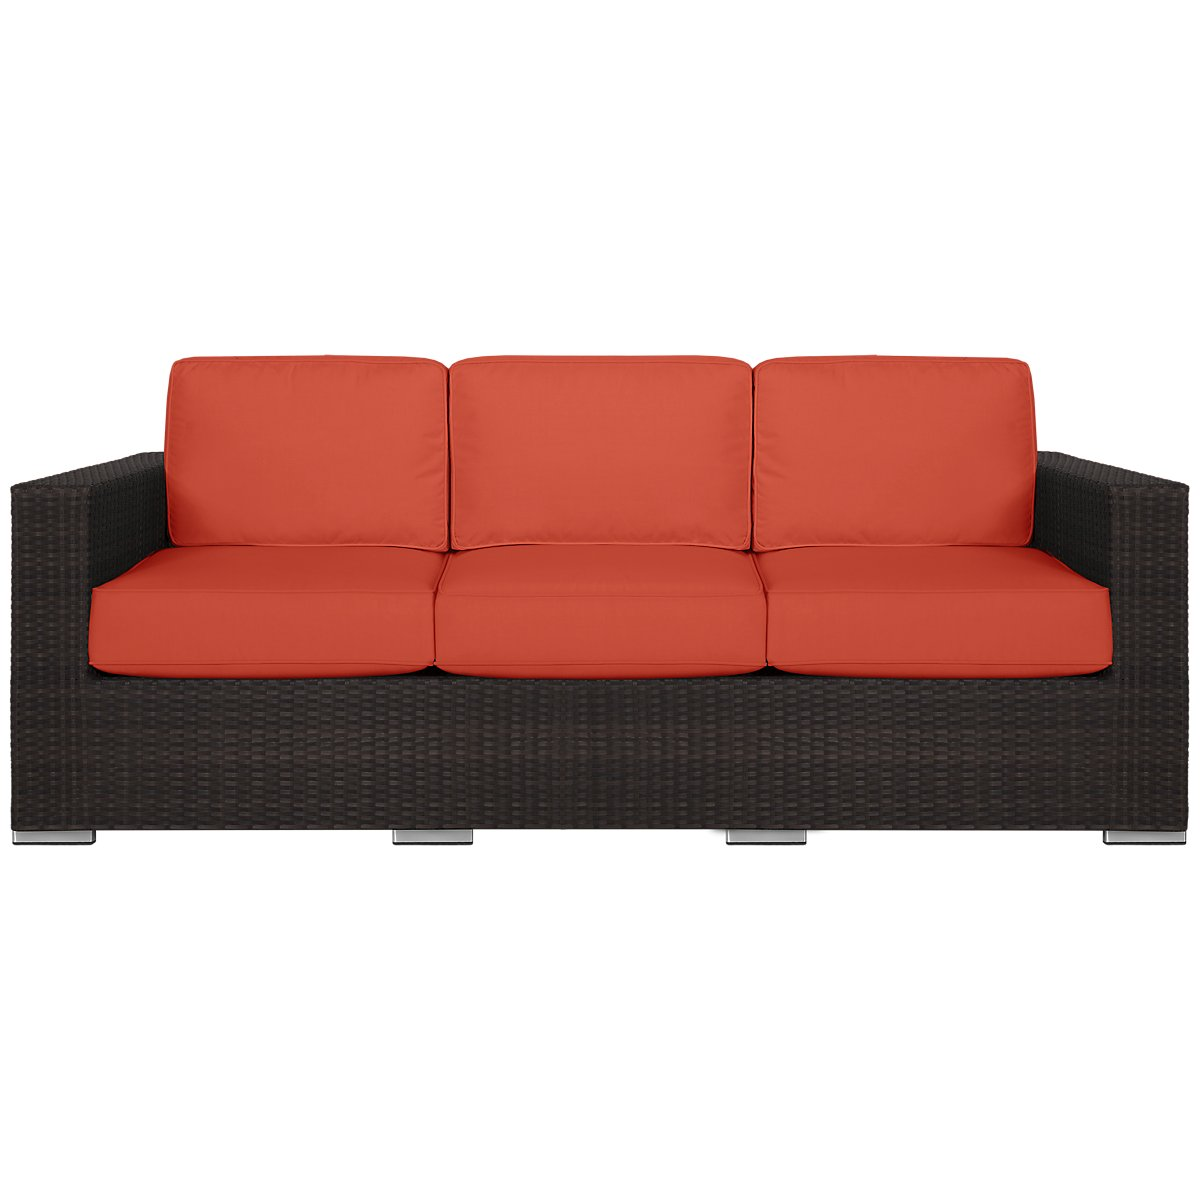 City furniture fina orange sofa for Orange sofa